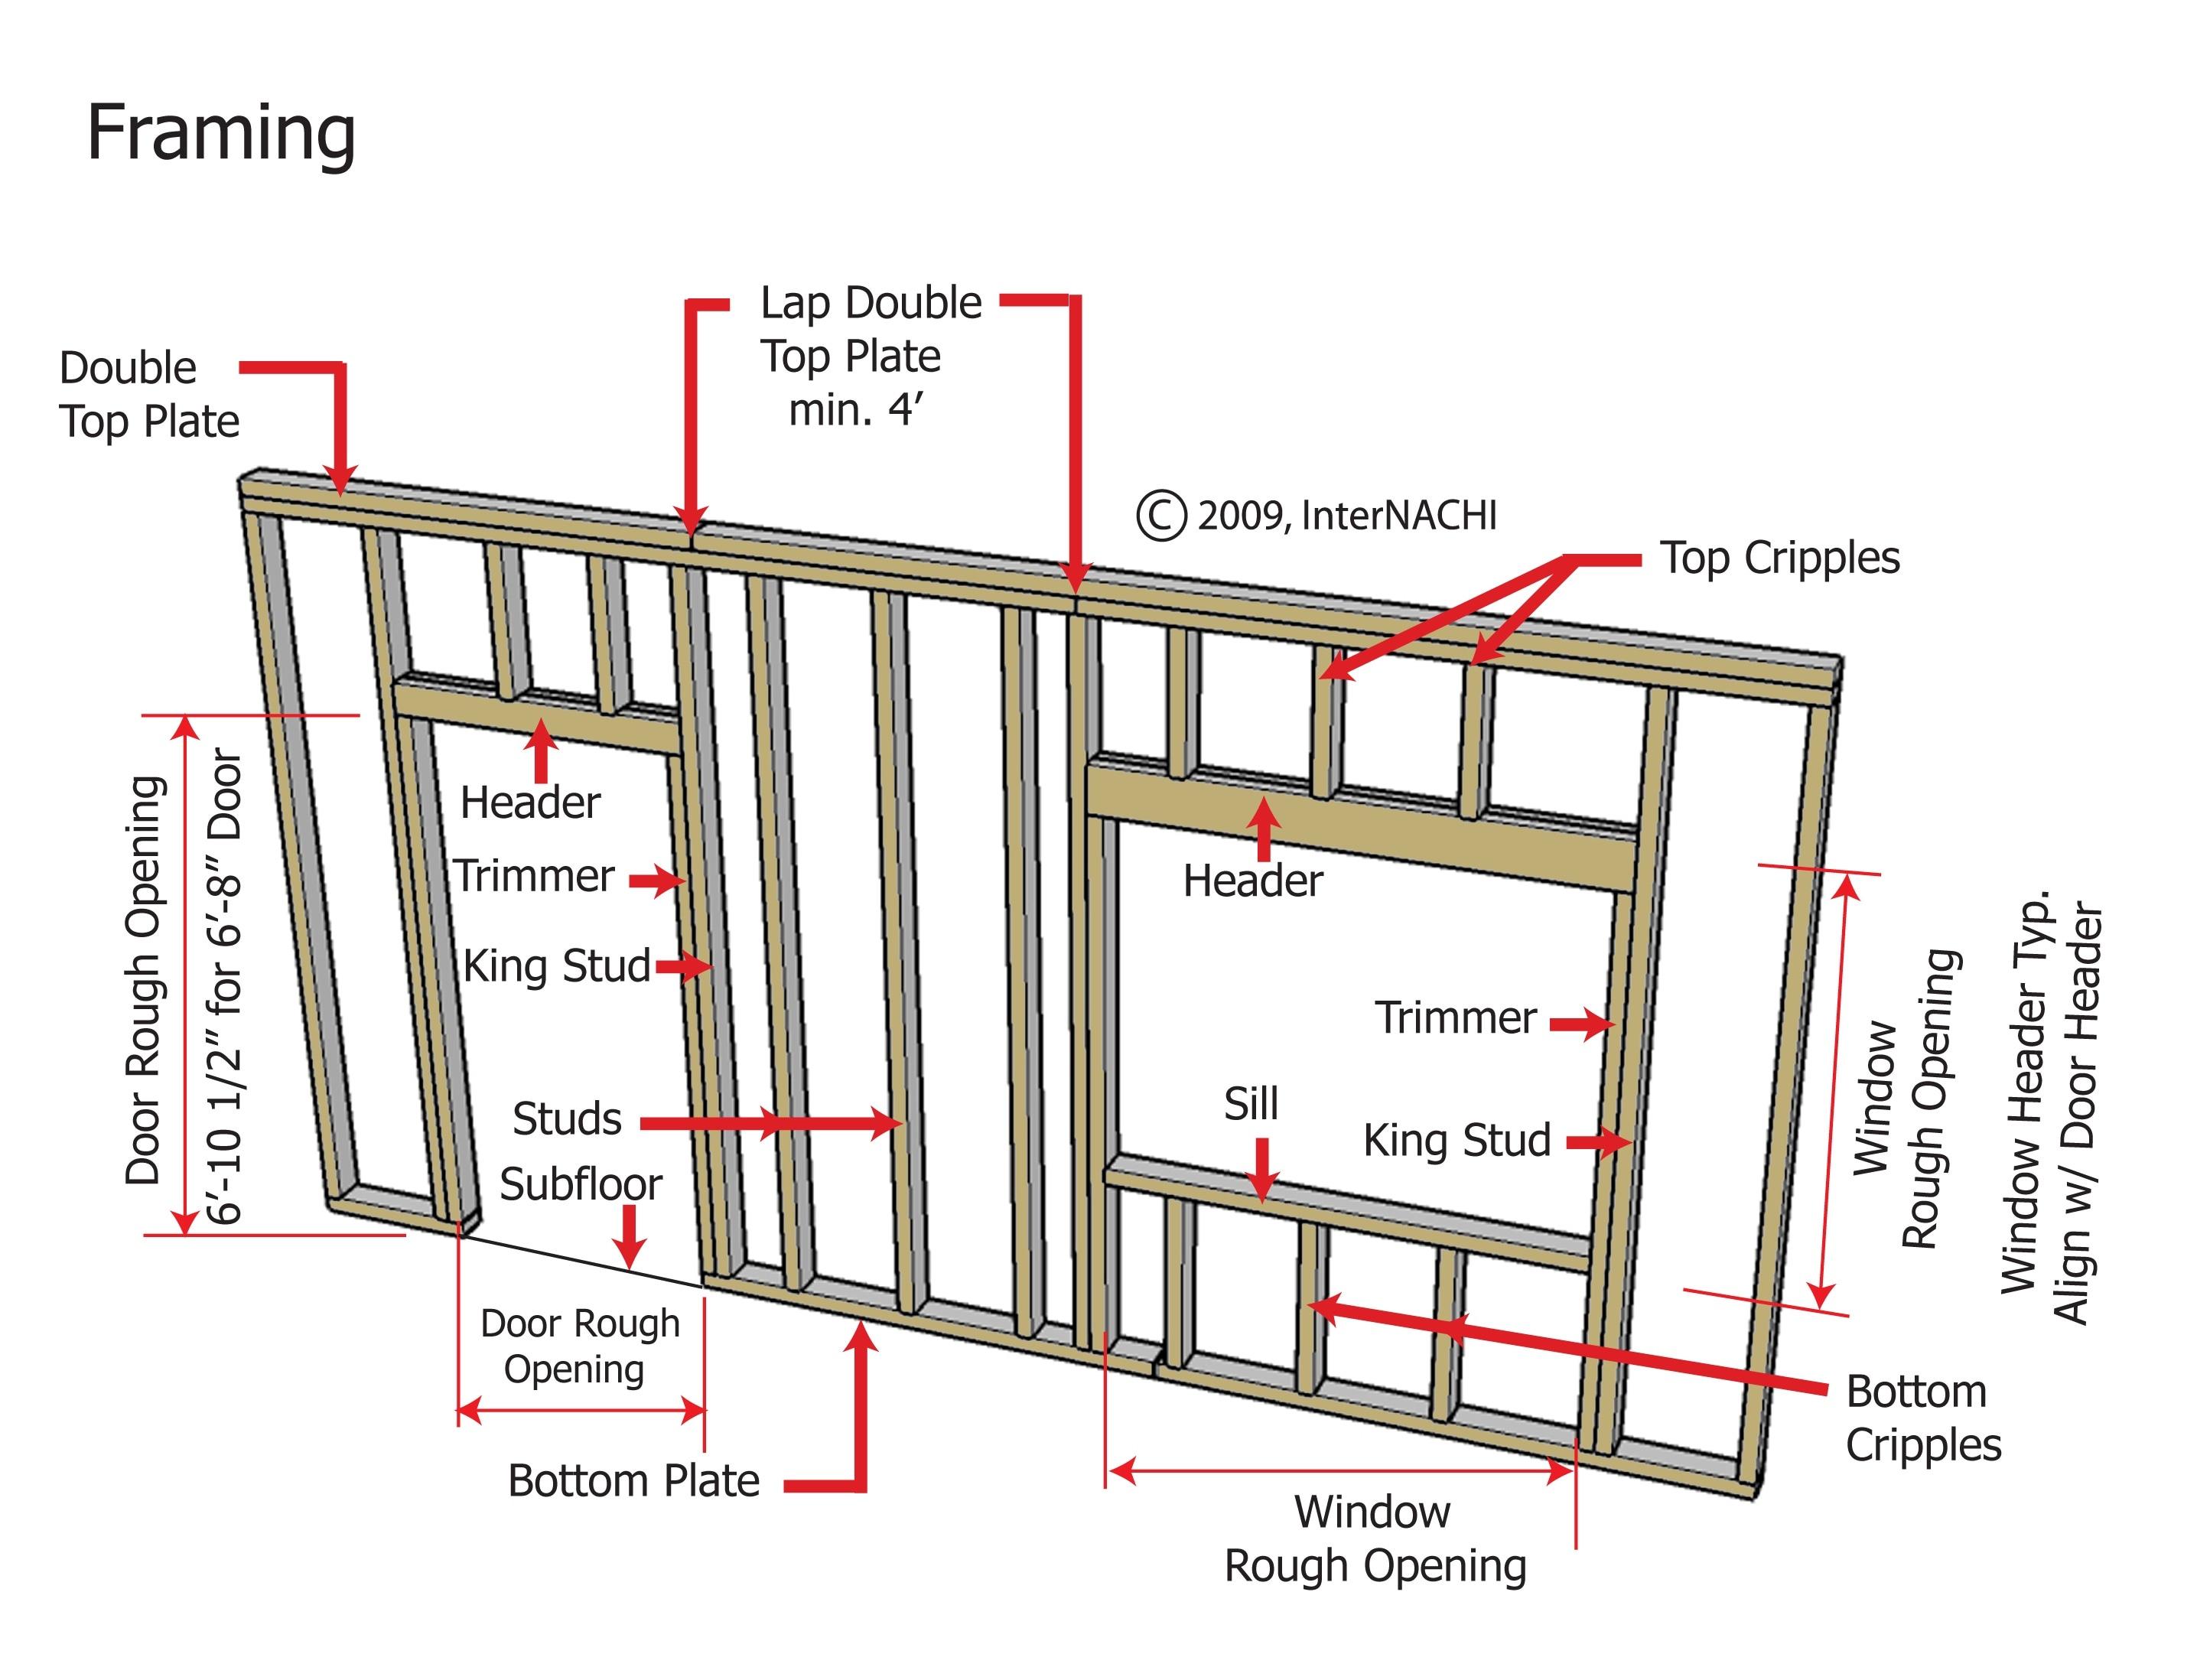 Framing Around Windows And Doors - Outdoor Furniture